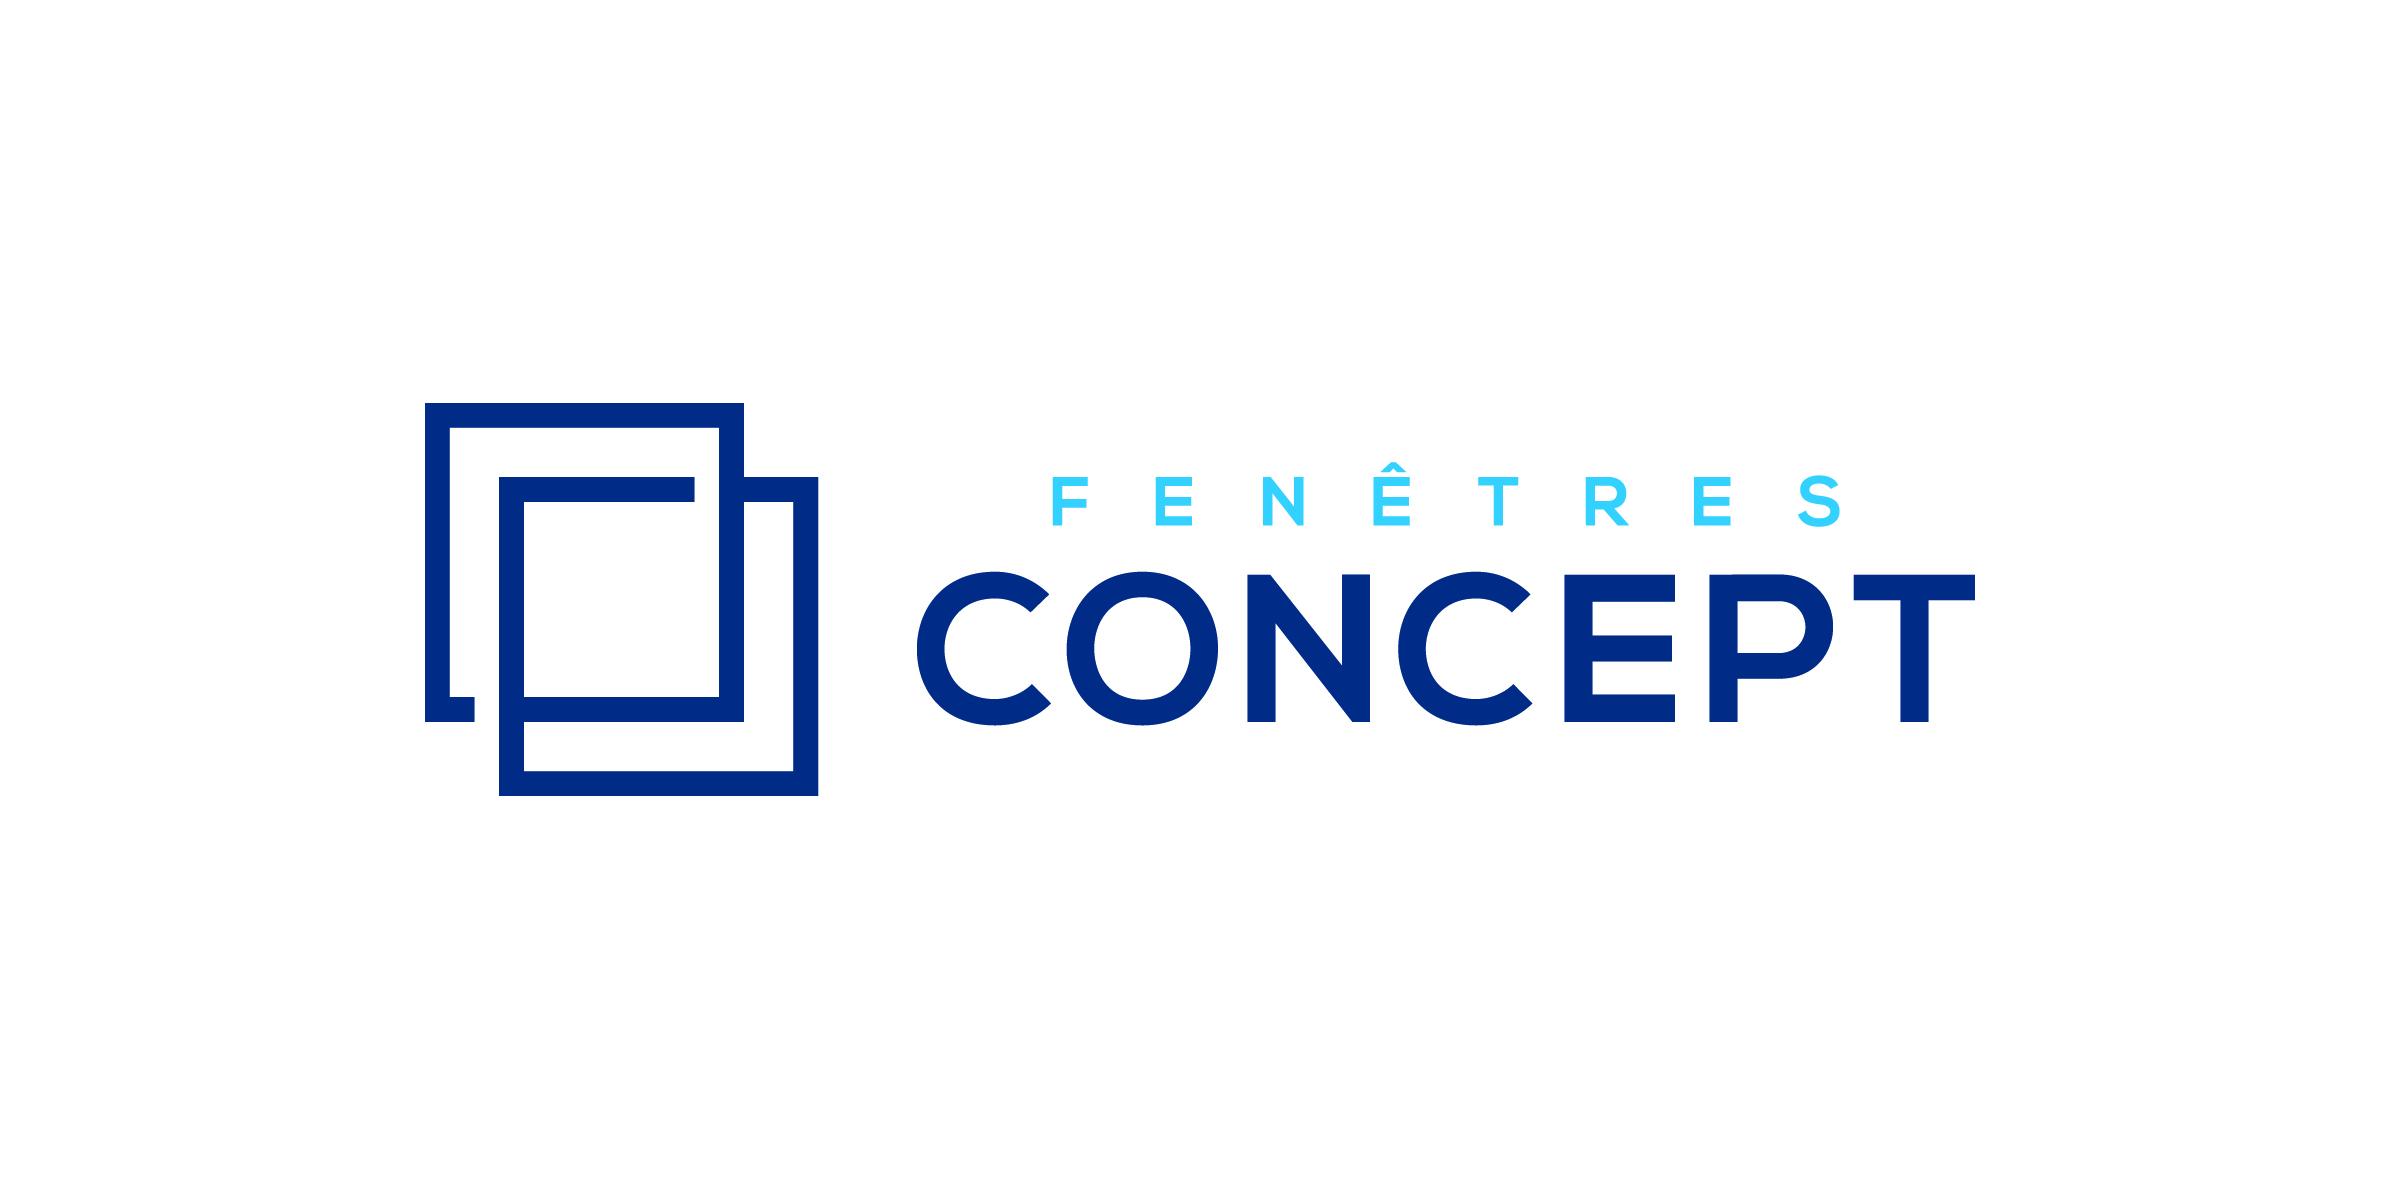 FENETRES CONCEPT INC.